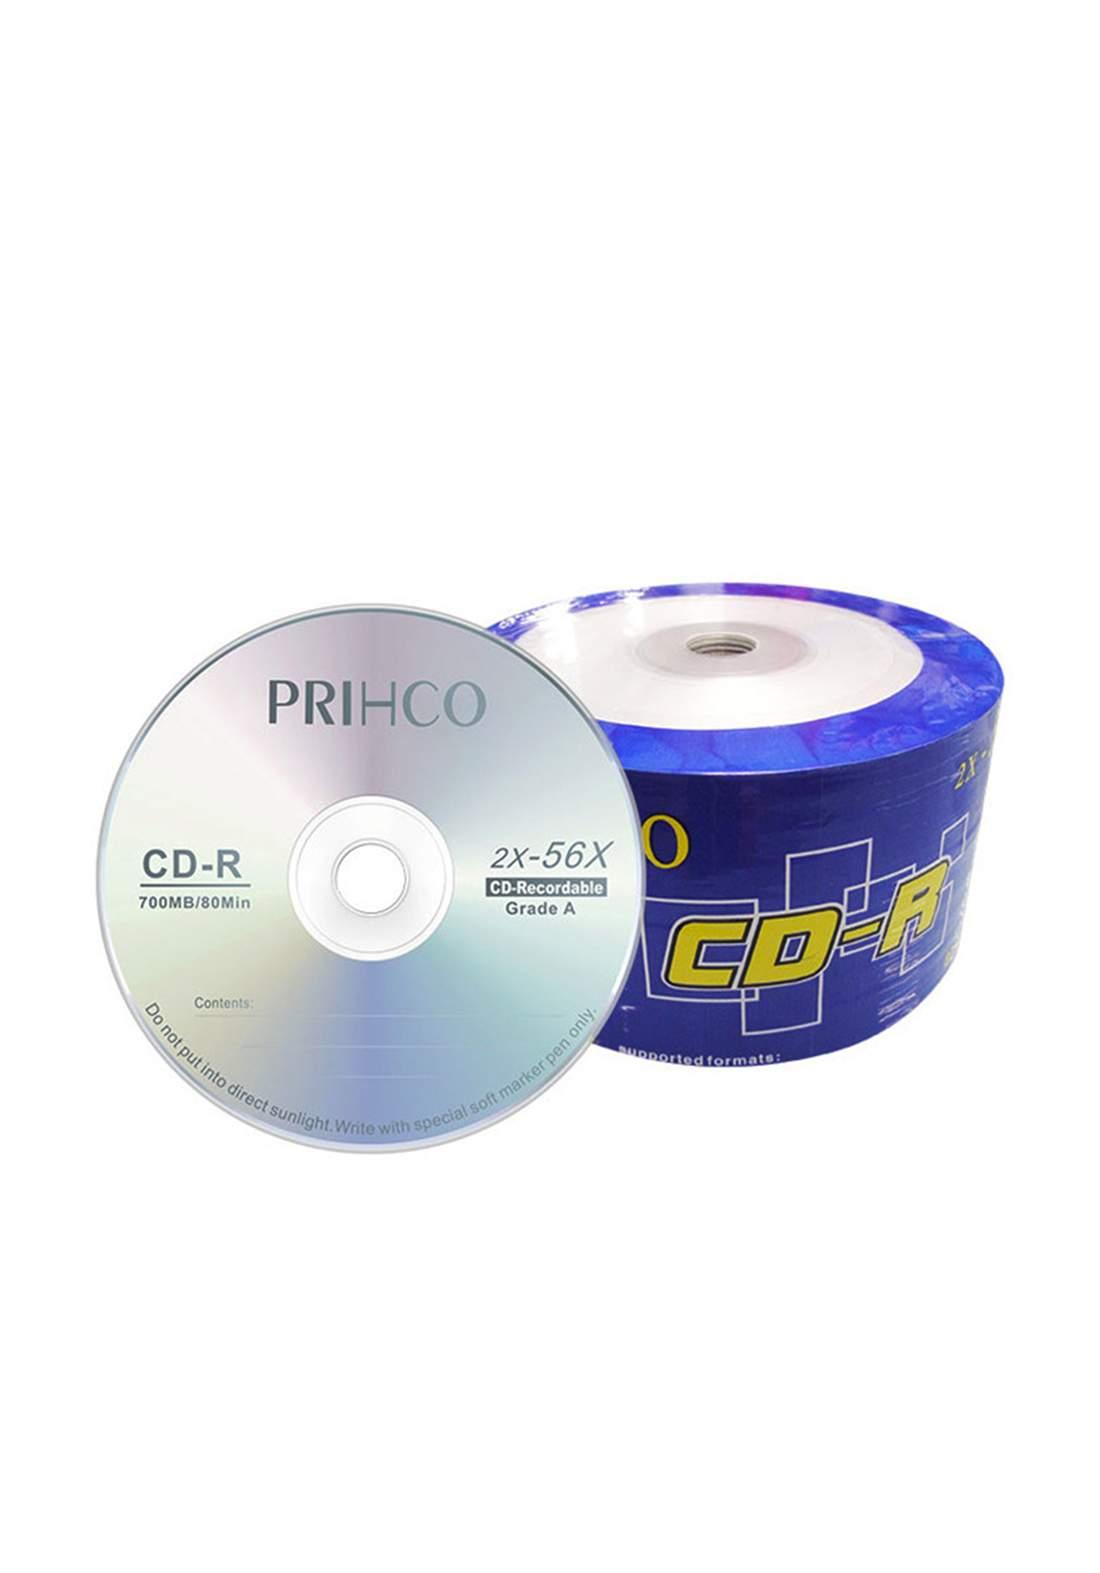 Princo Cd-blank -White قرص